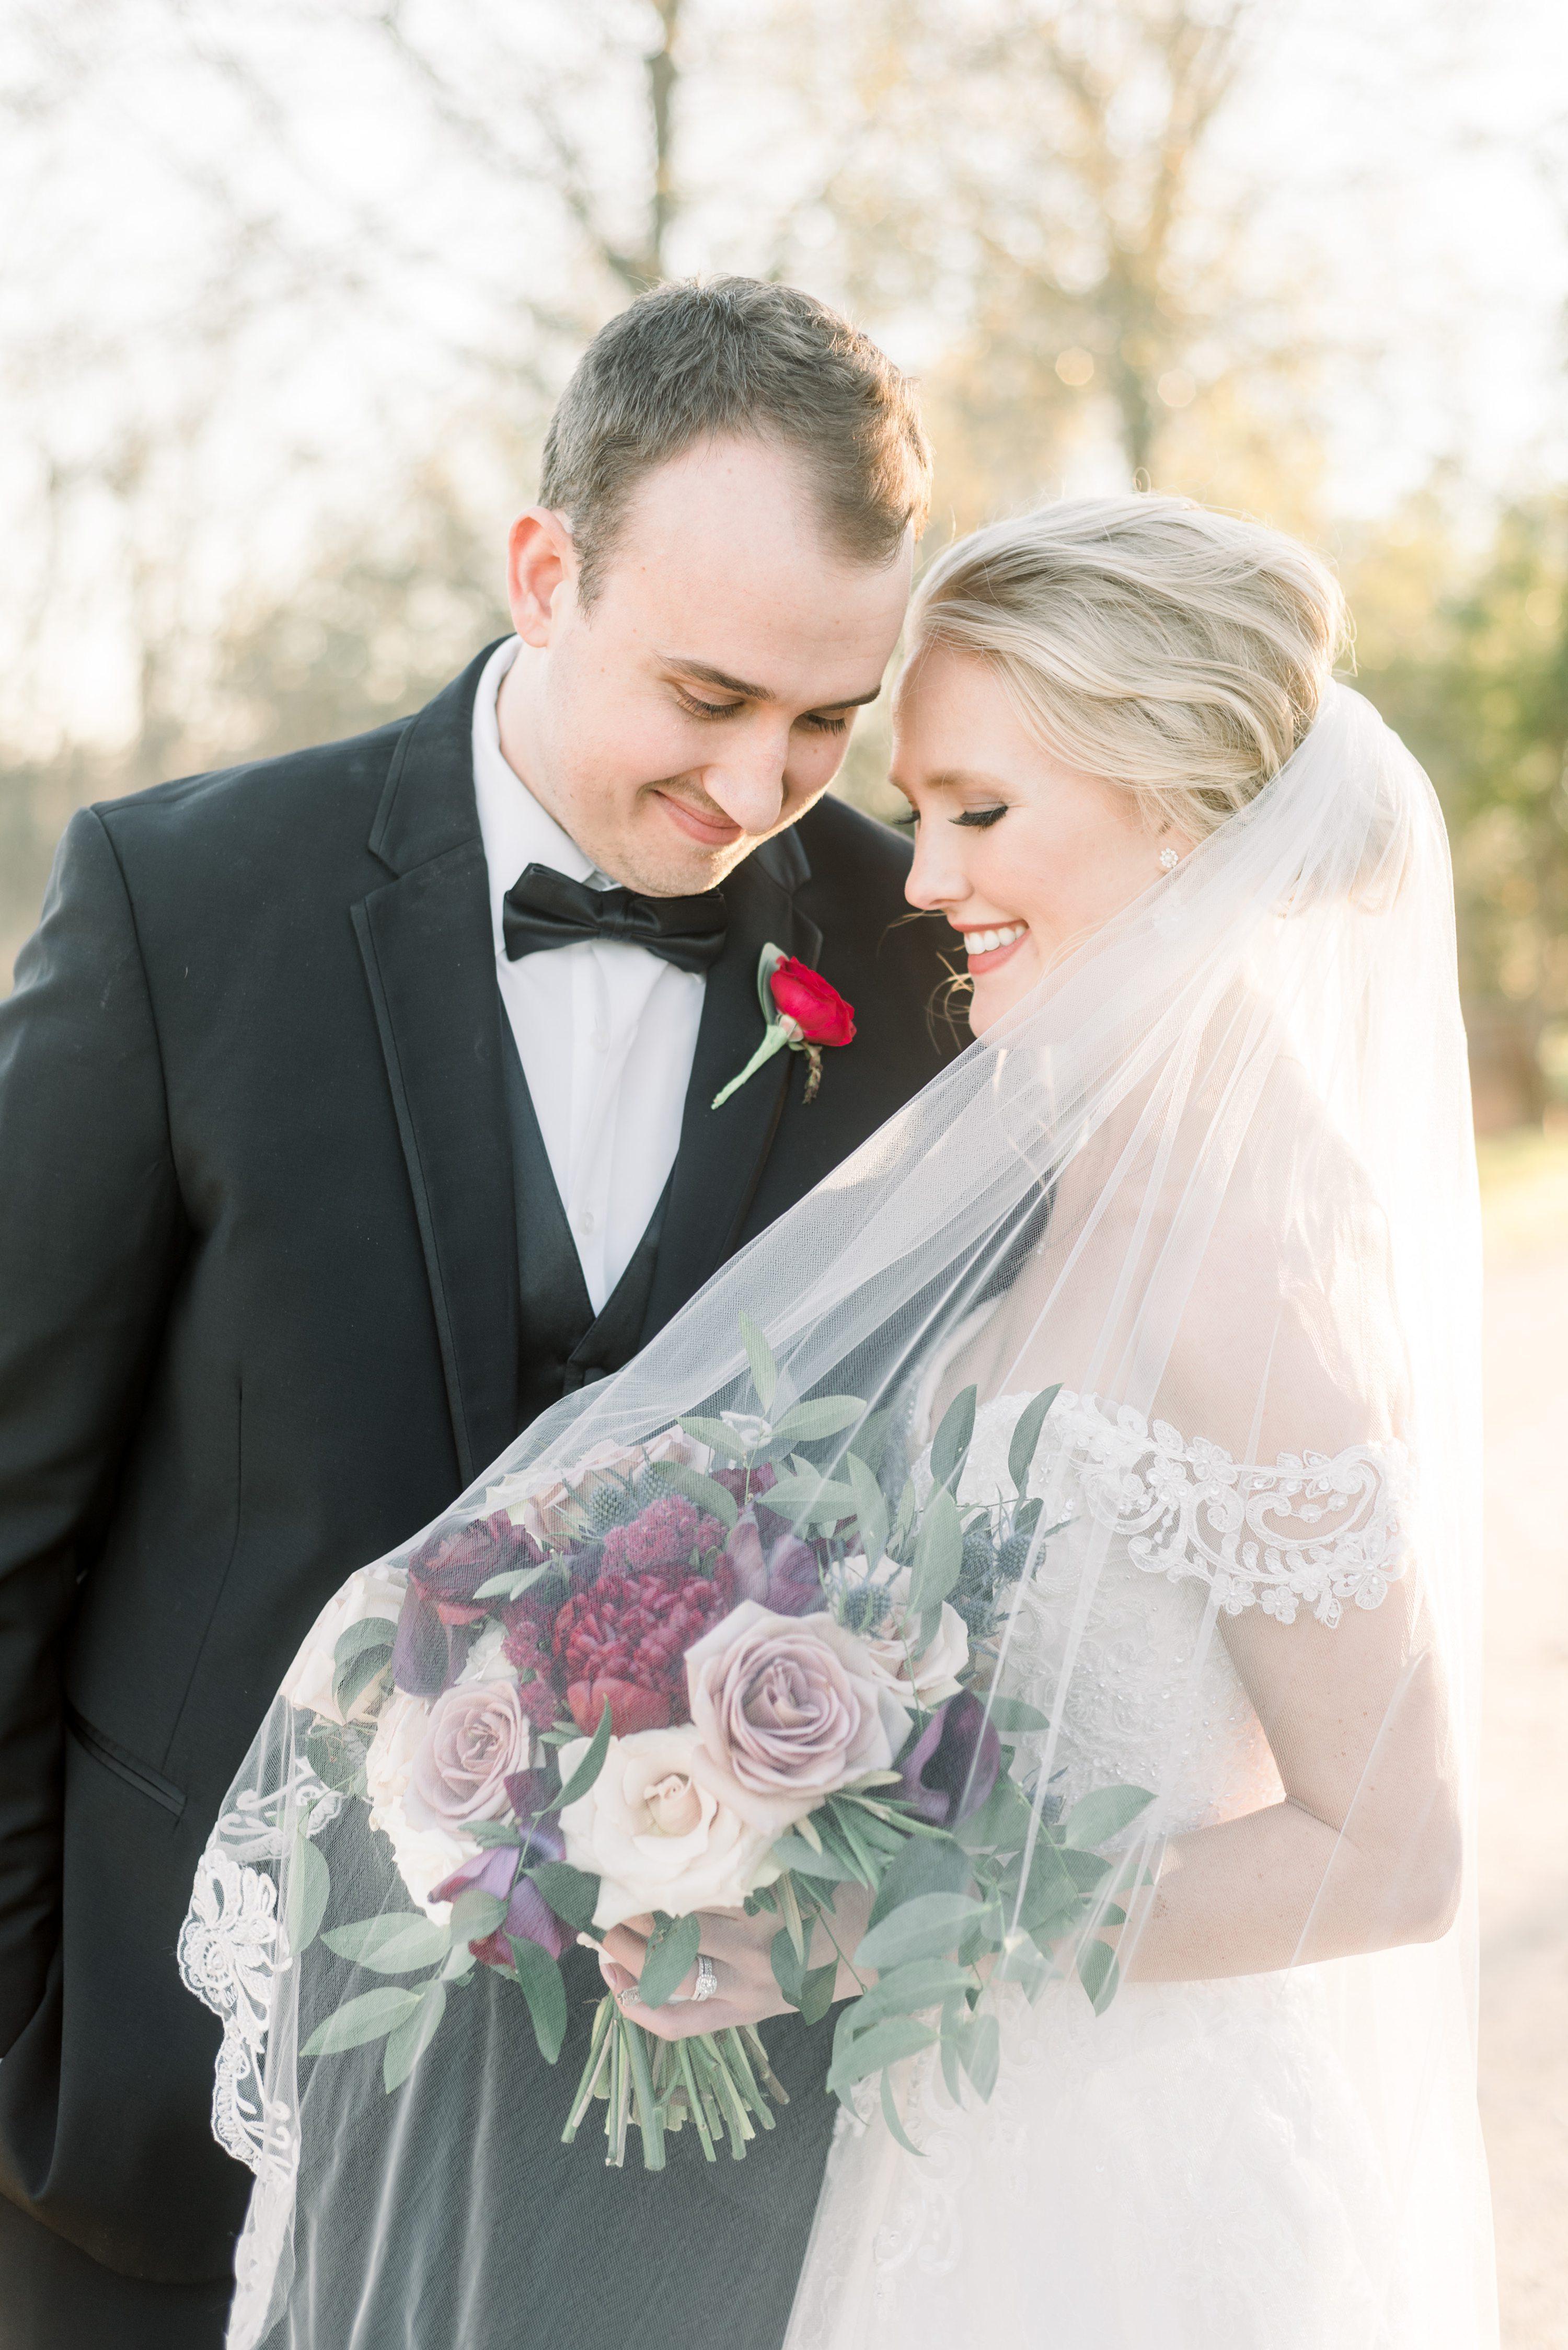 Houston Wedding Photography,Beckendorff Farms